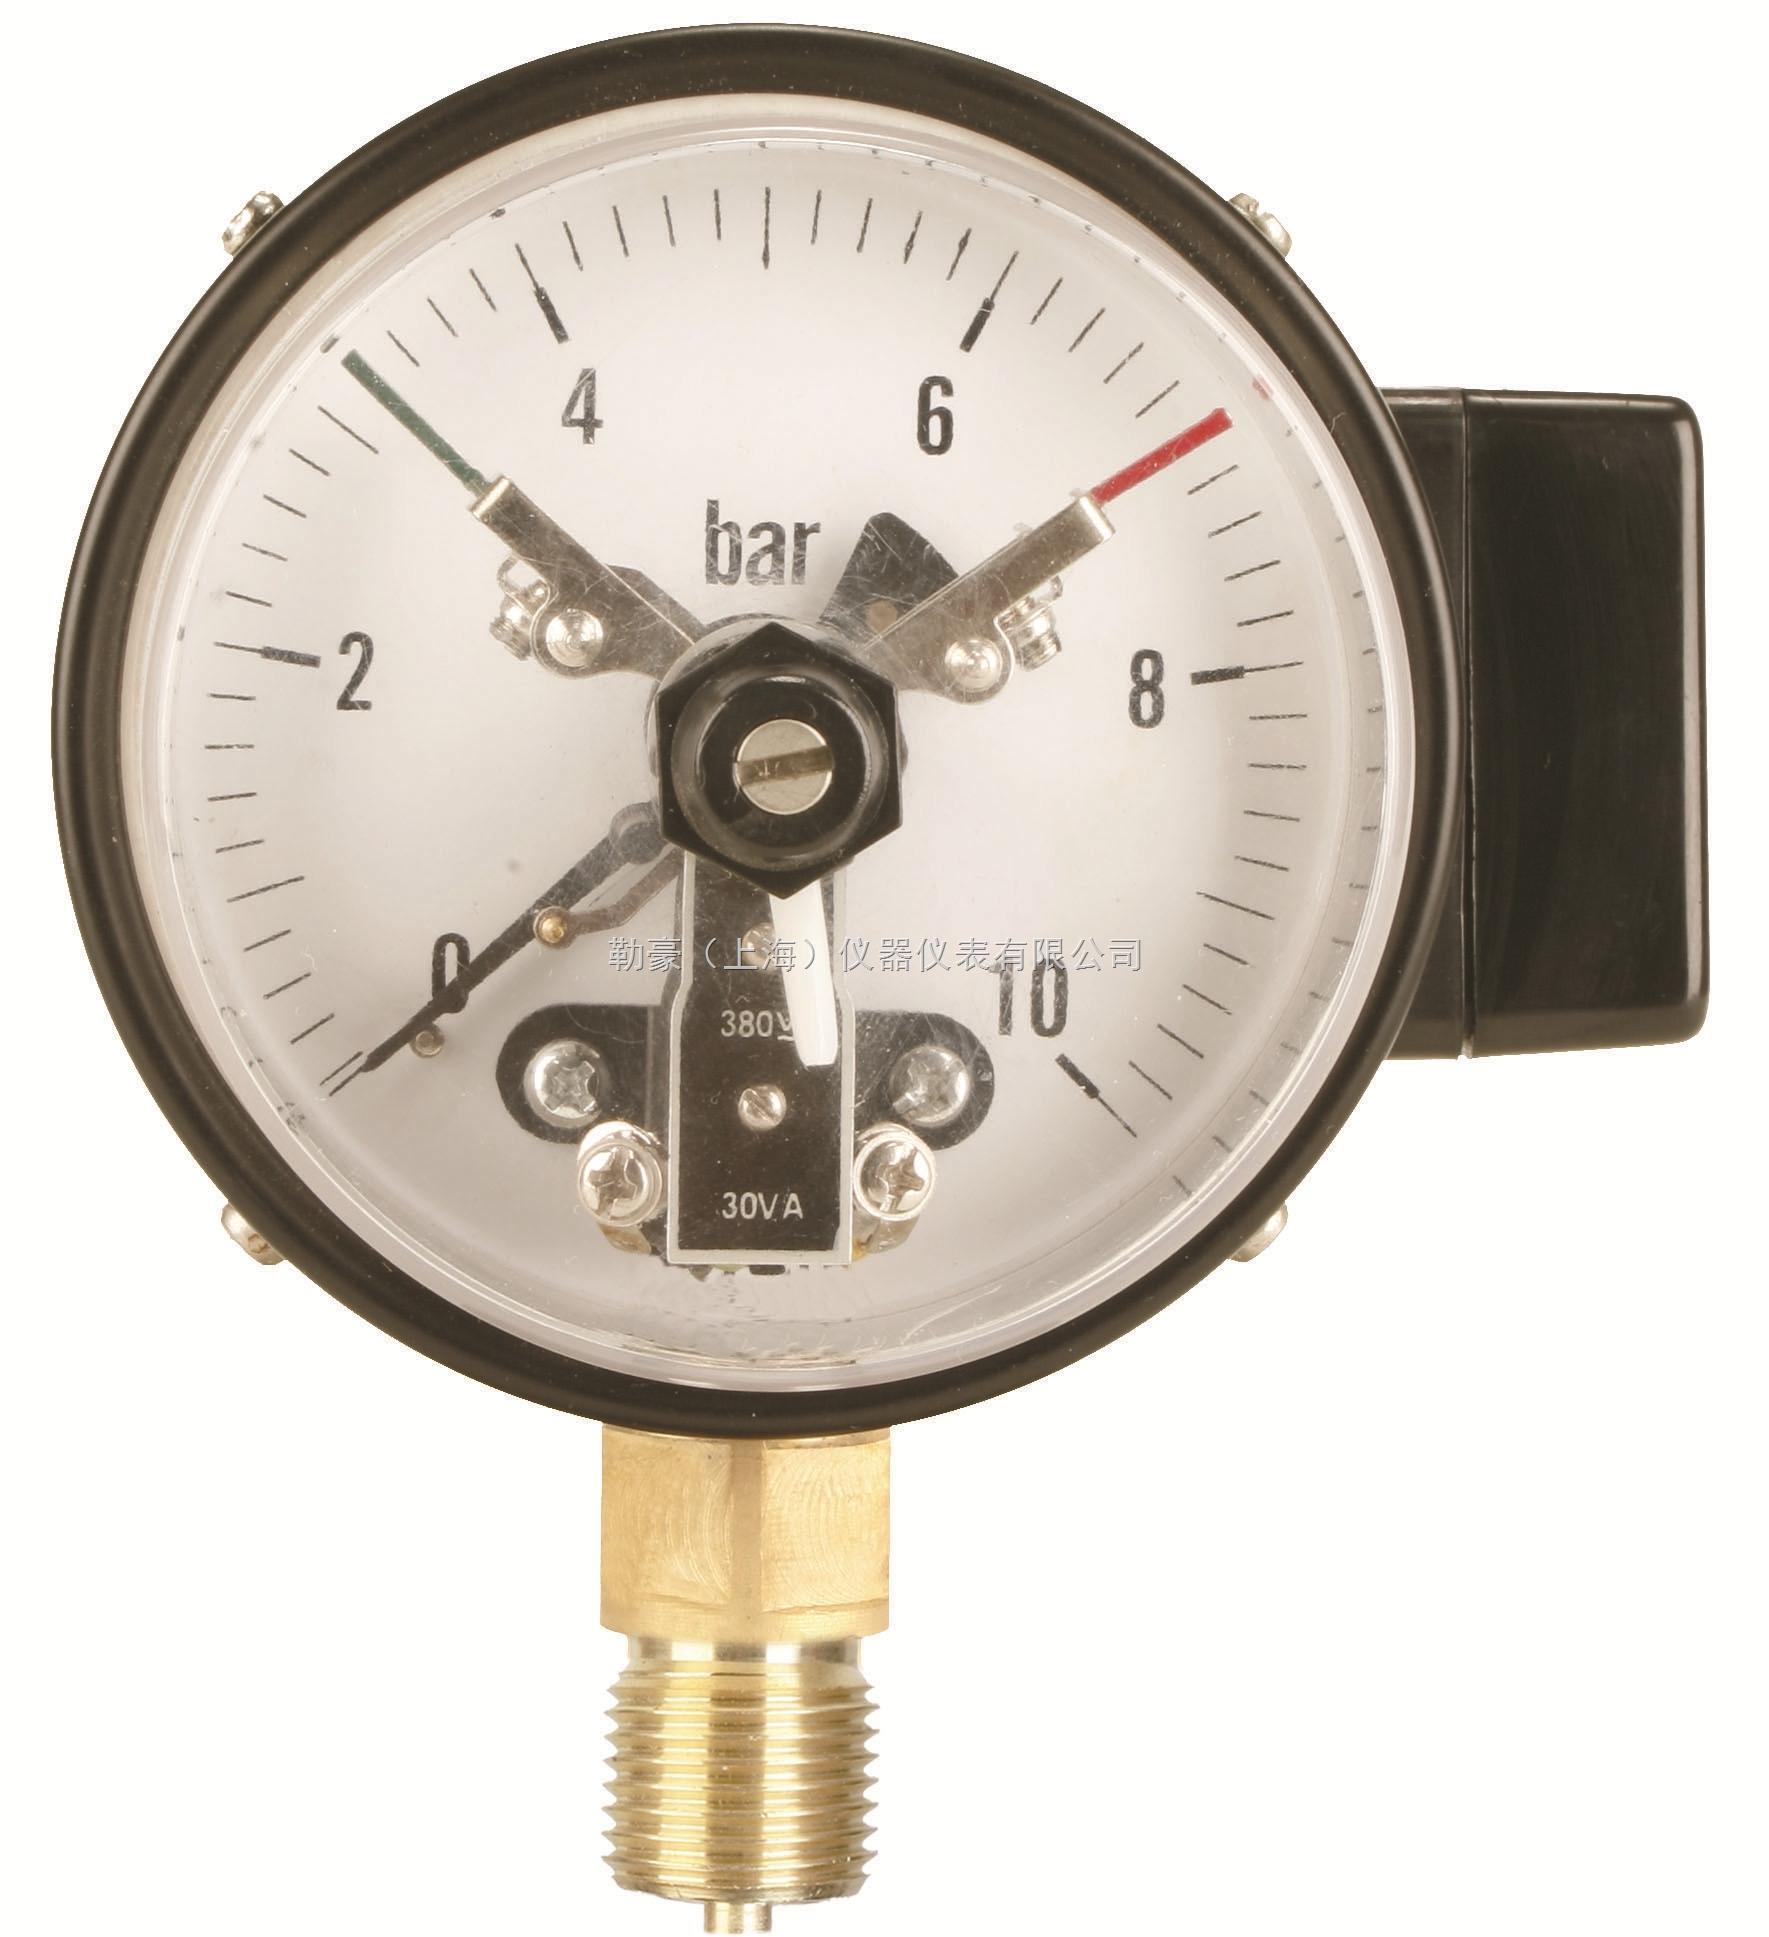 yxc-100普通型径向电接点压力表